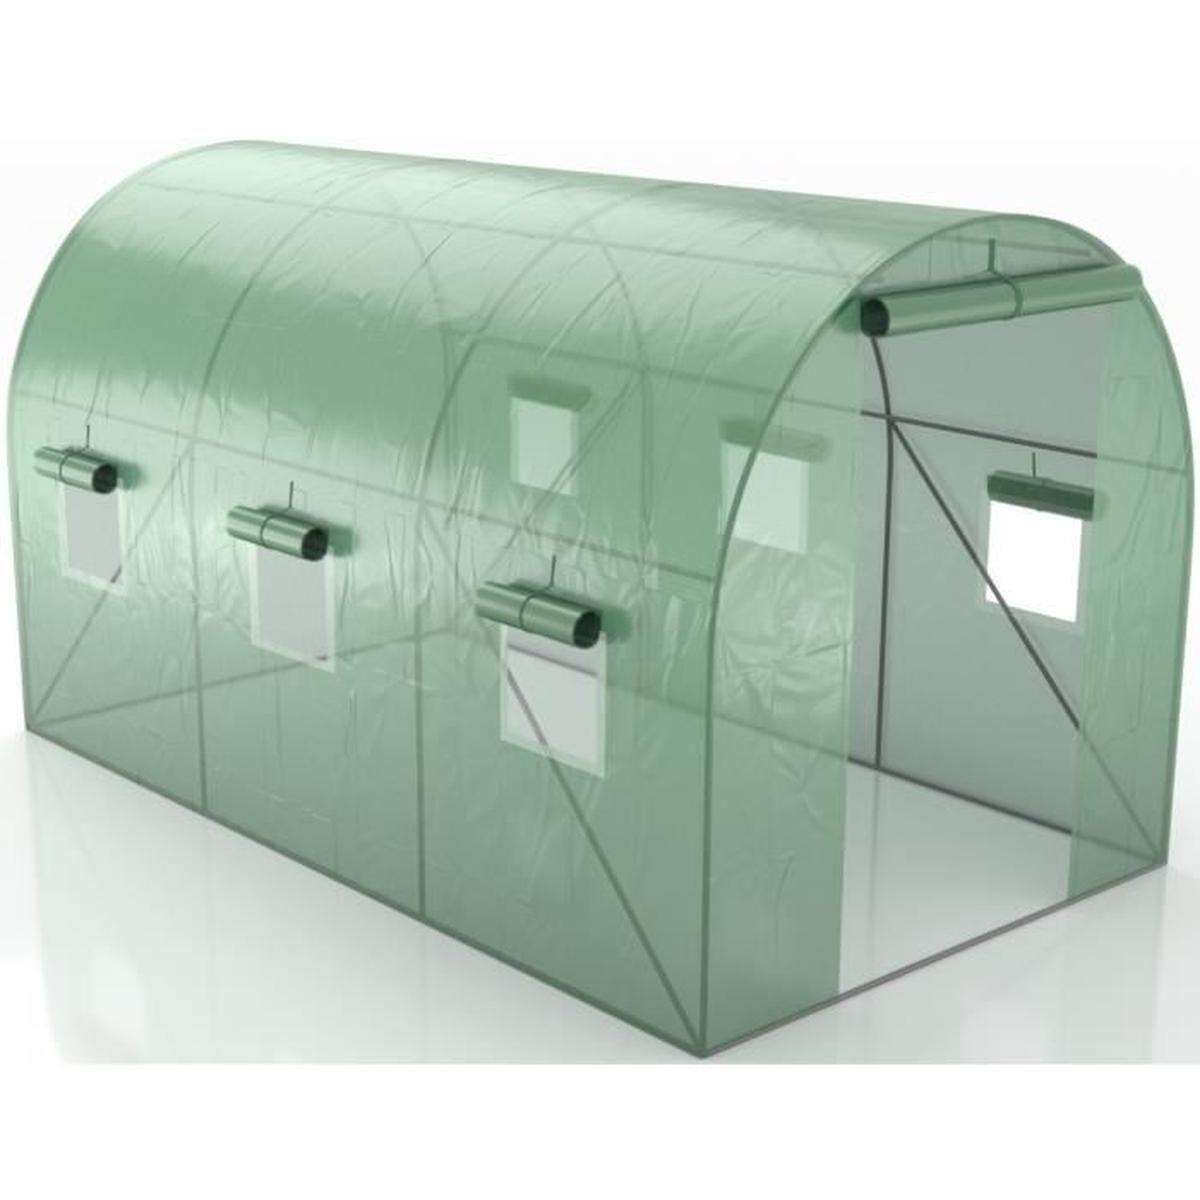 Green Roof - Serre De Jardin Tunnel 7M2 - 3,5X2M à Serre De Jardin Pas Chere